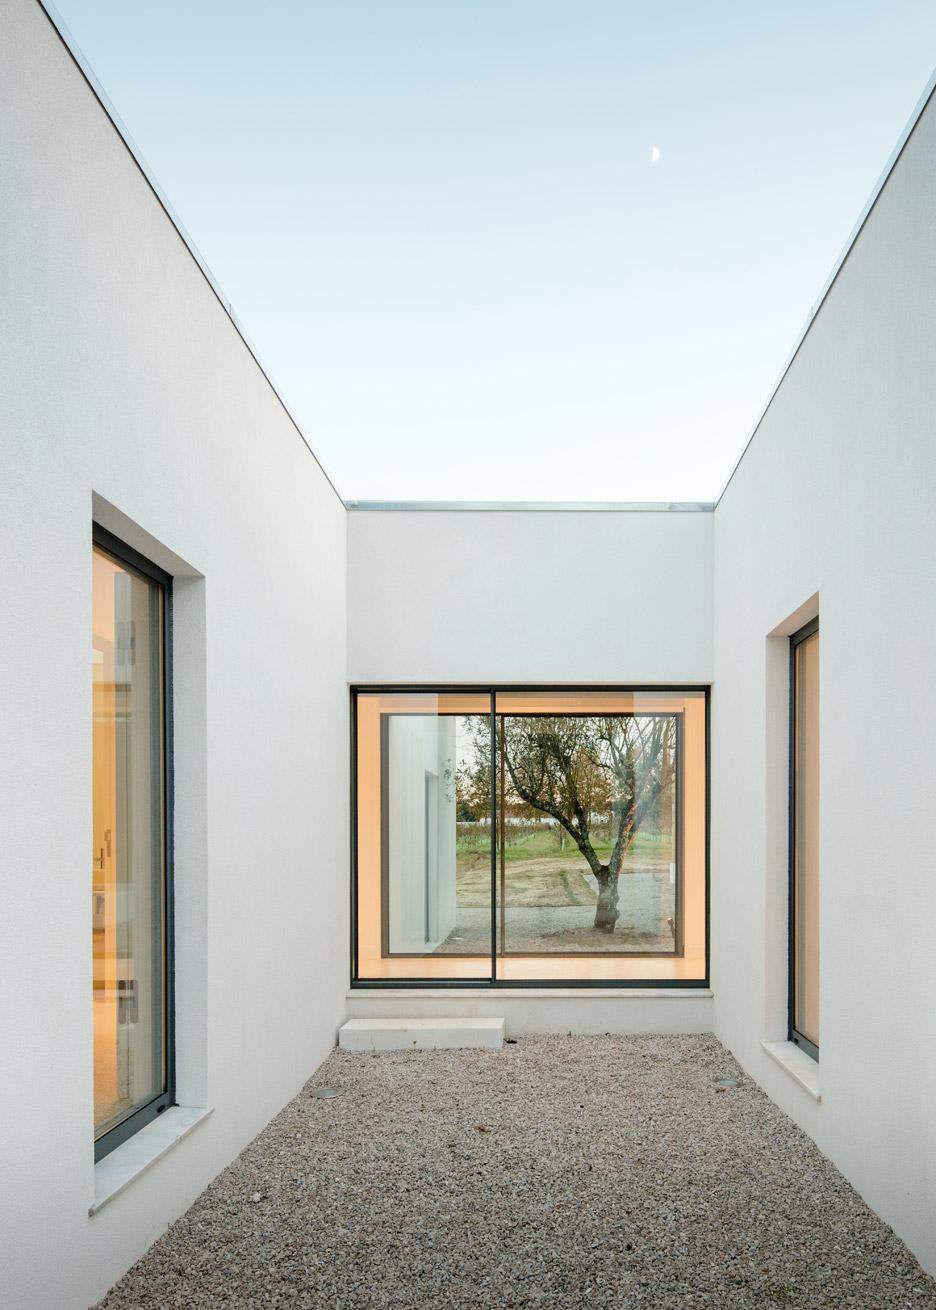 vineyard-house-blaanc-architecture-residential-montijo-portugal-rammed-earth-joao-morgado_dezeen_936_30